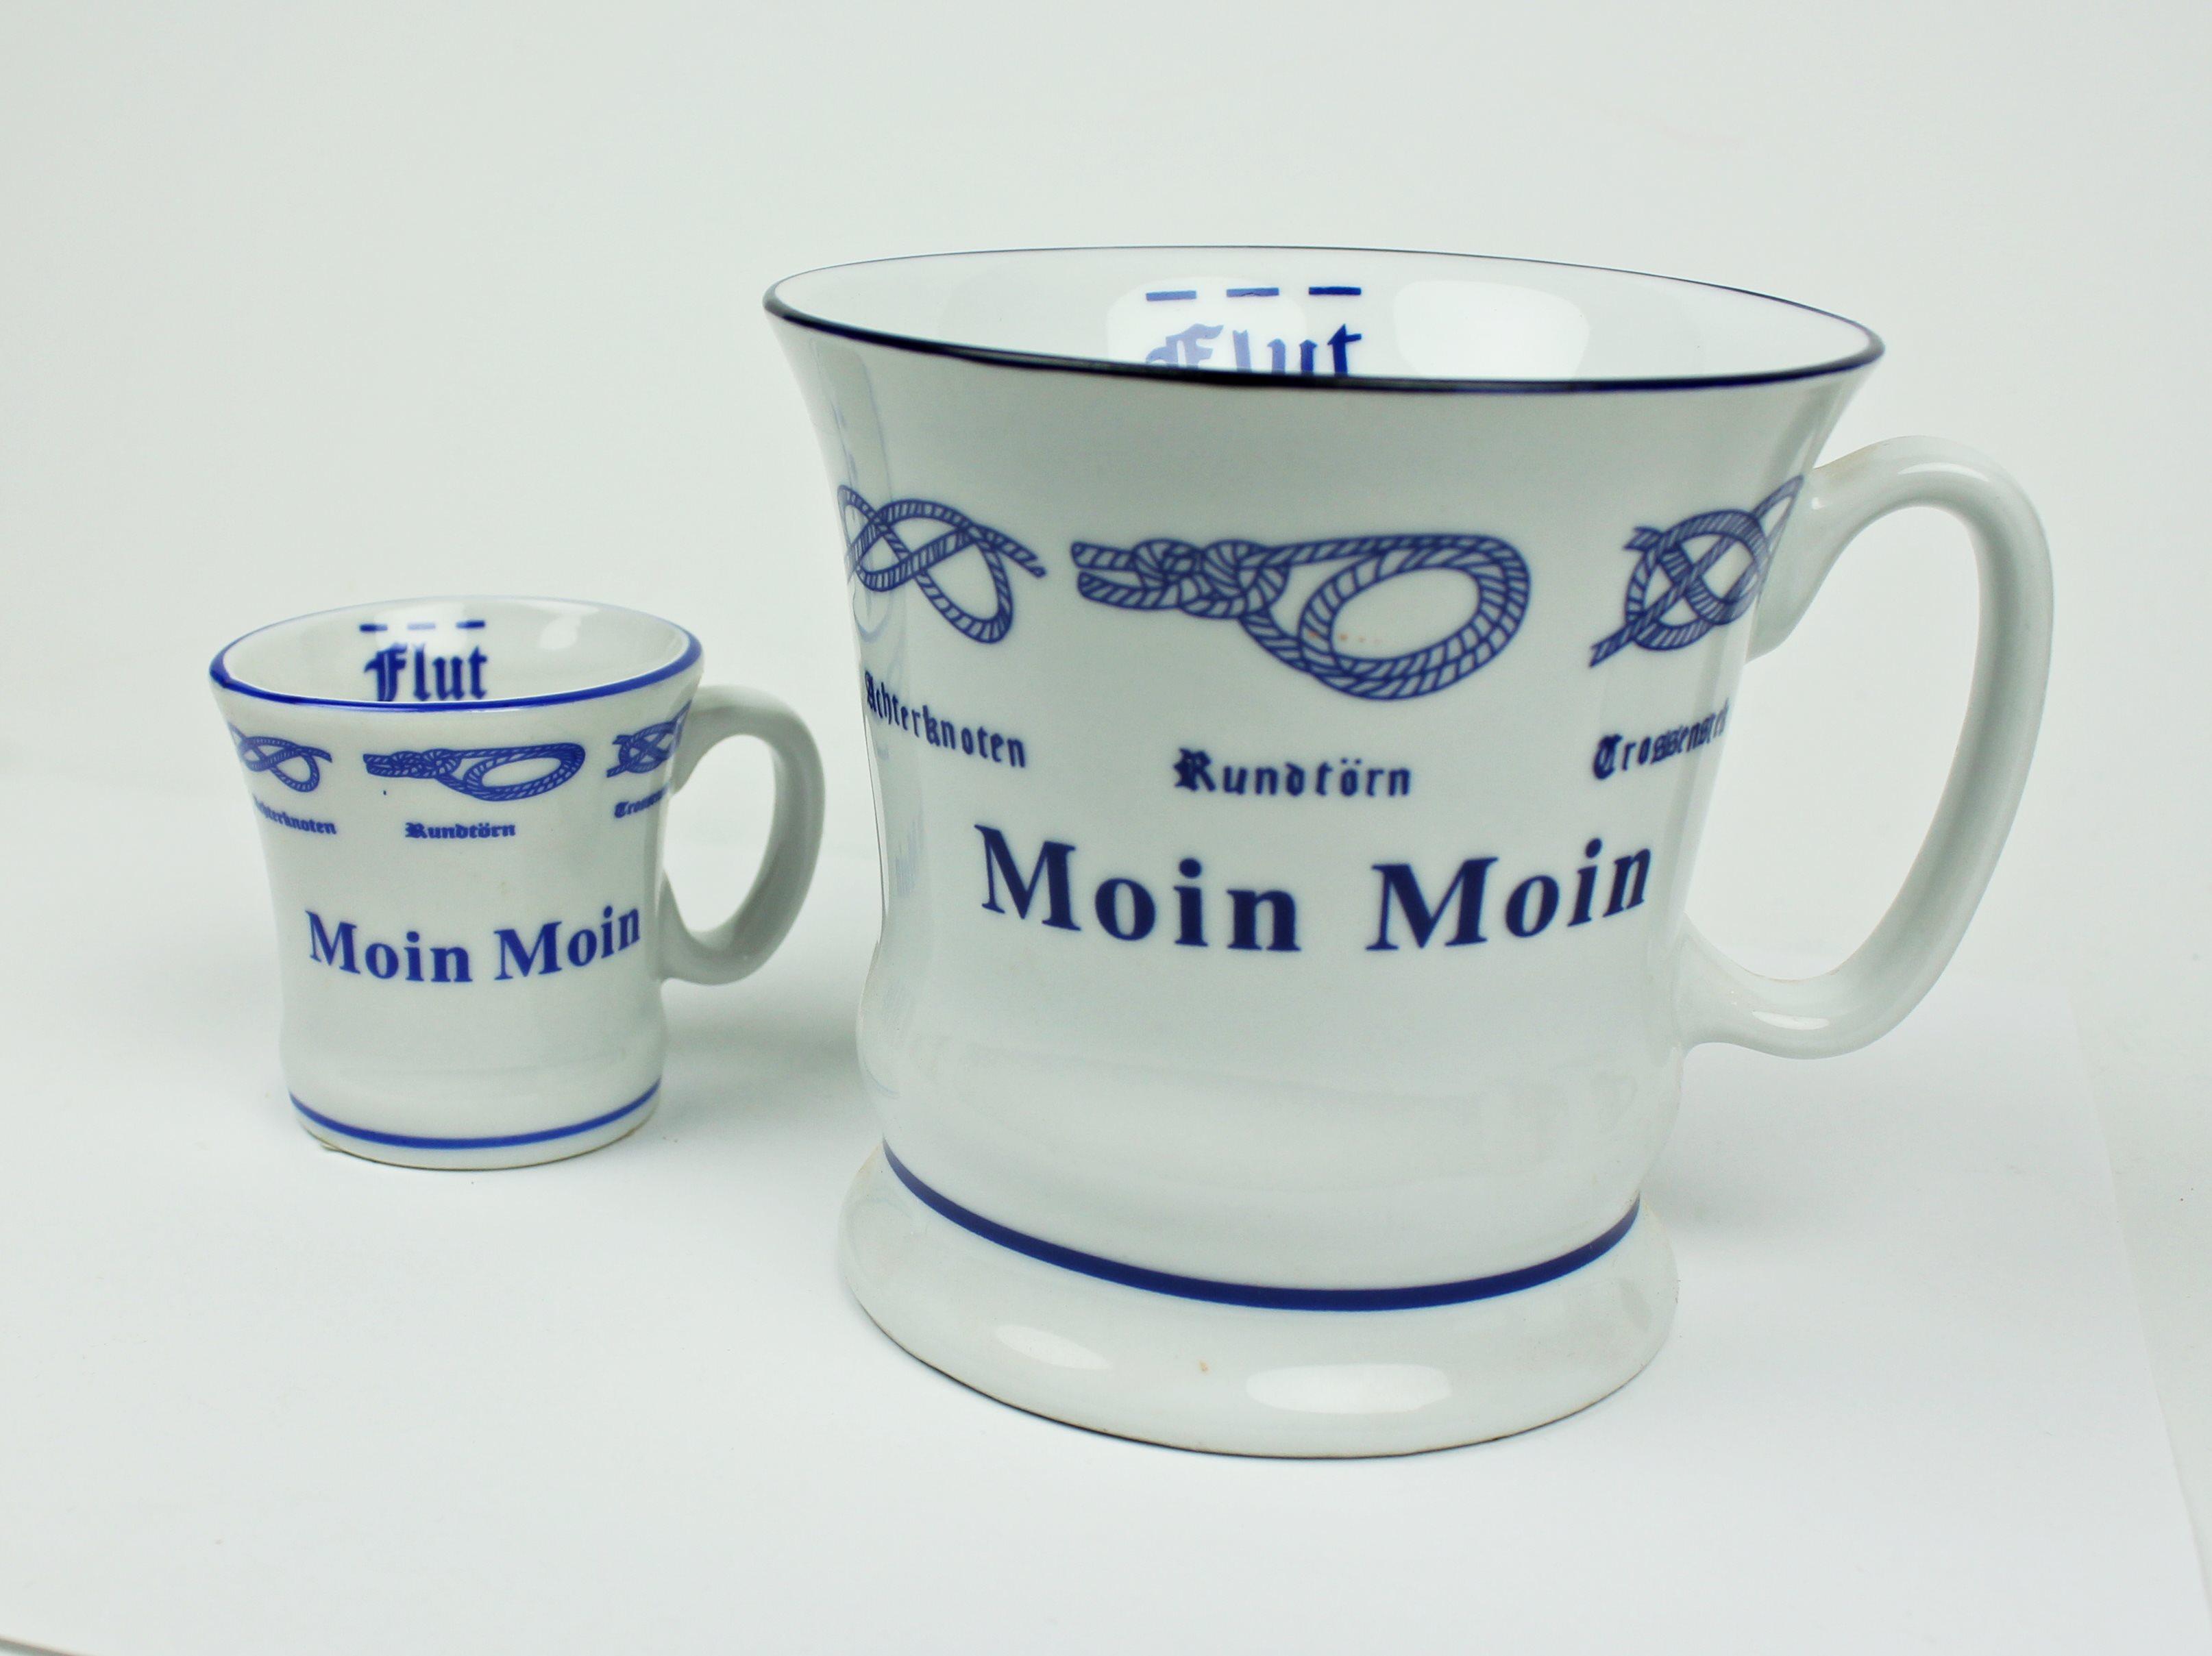 Moin Moin Kaffeepott + Moin Moin Pöttchen mit Seemannsknoten